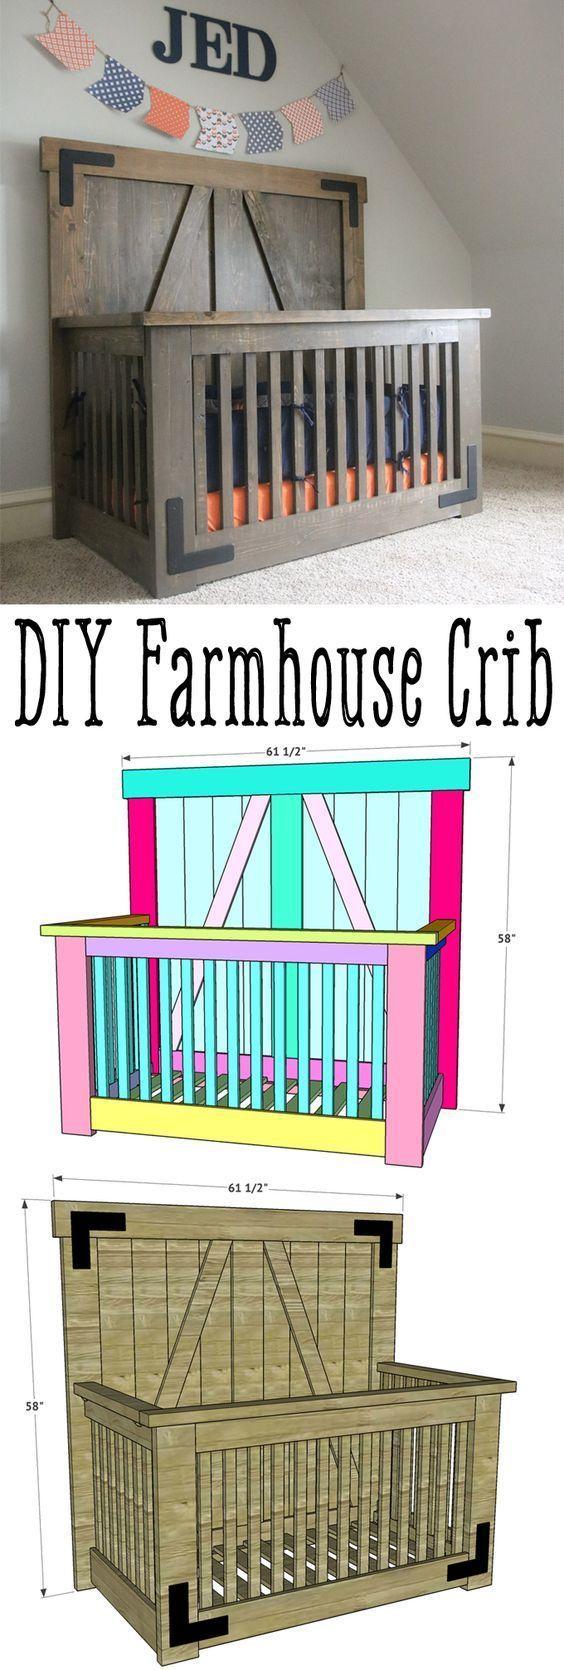 DIY Farmhouse Crib images